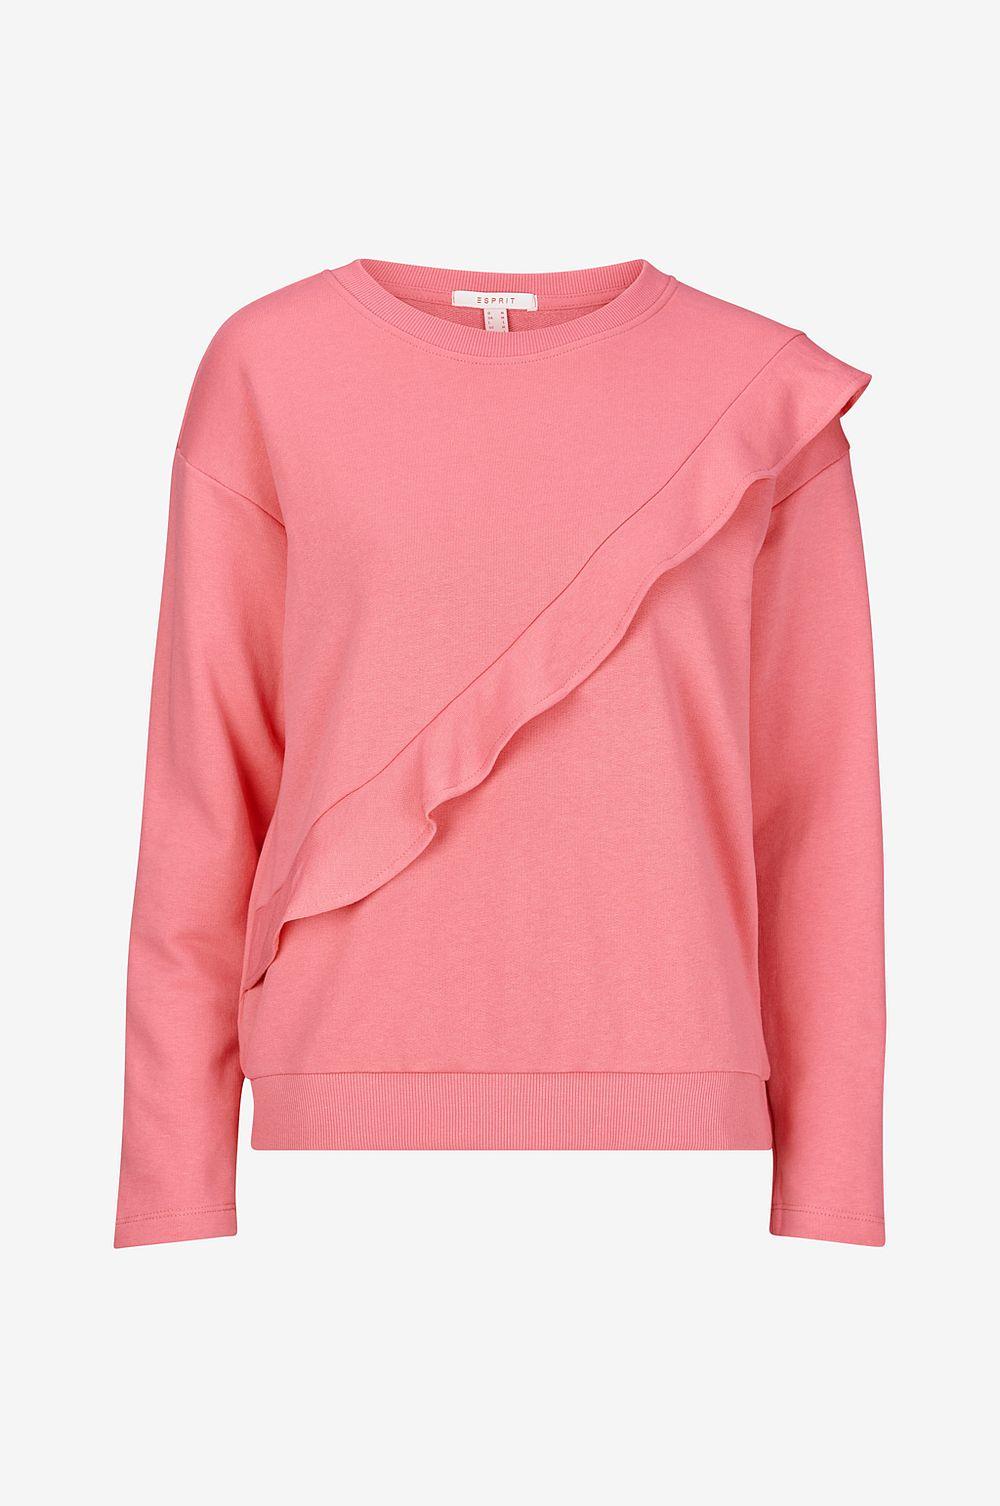 5fc866b8d Esprit Sweatshirt med volang - rosa - Dam llrszl292-Damkläder - www ...